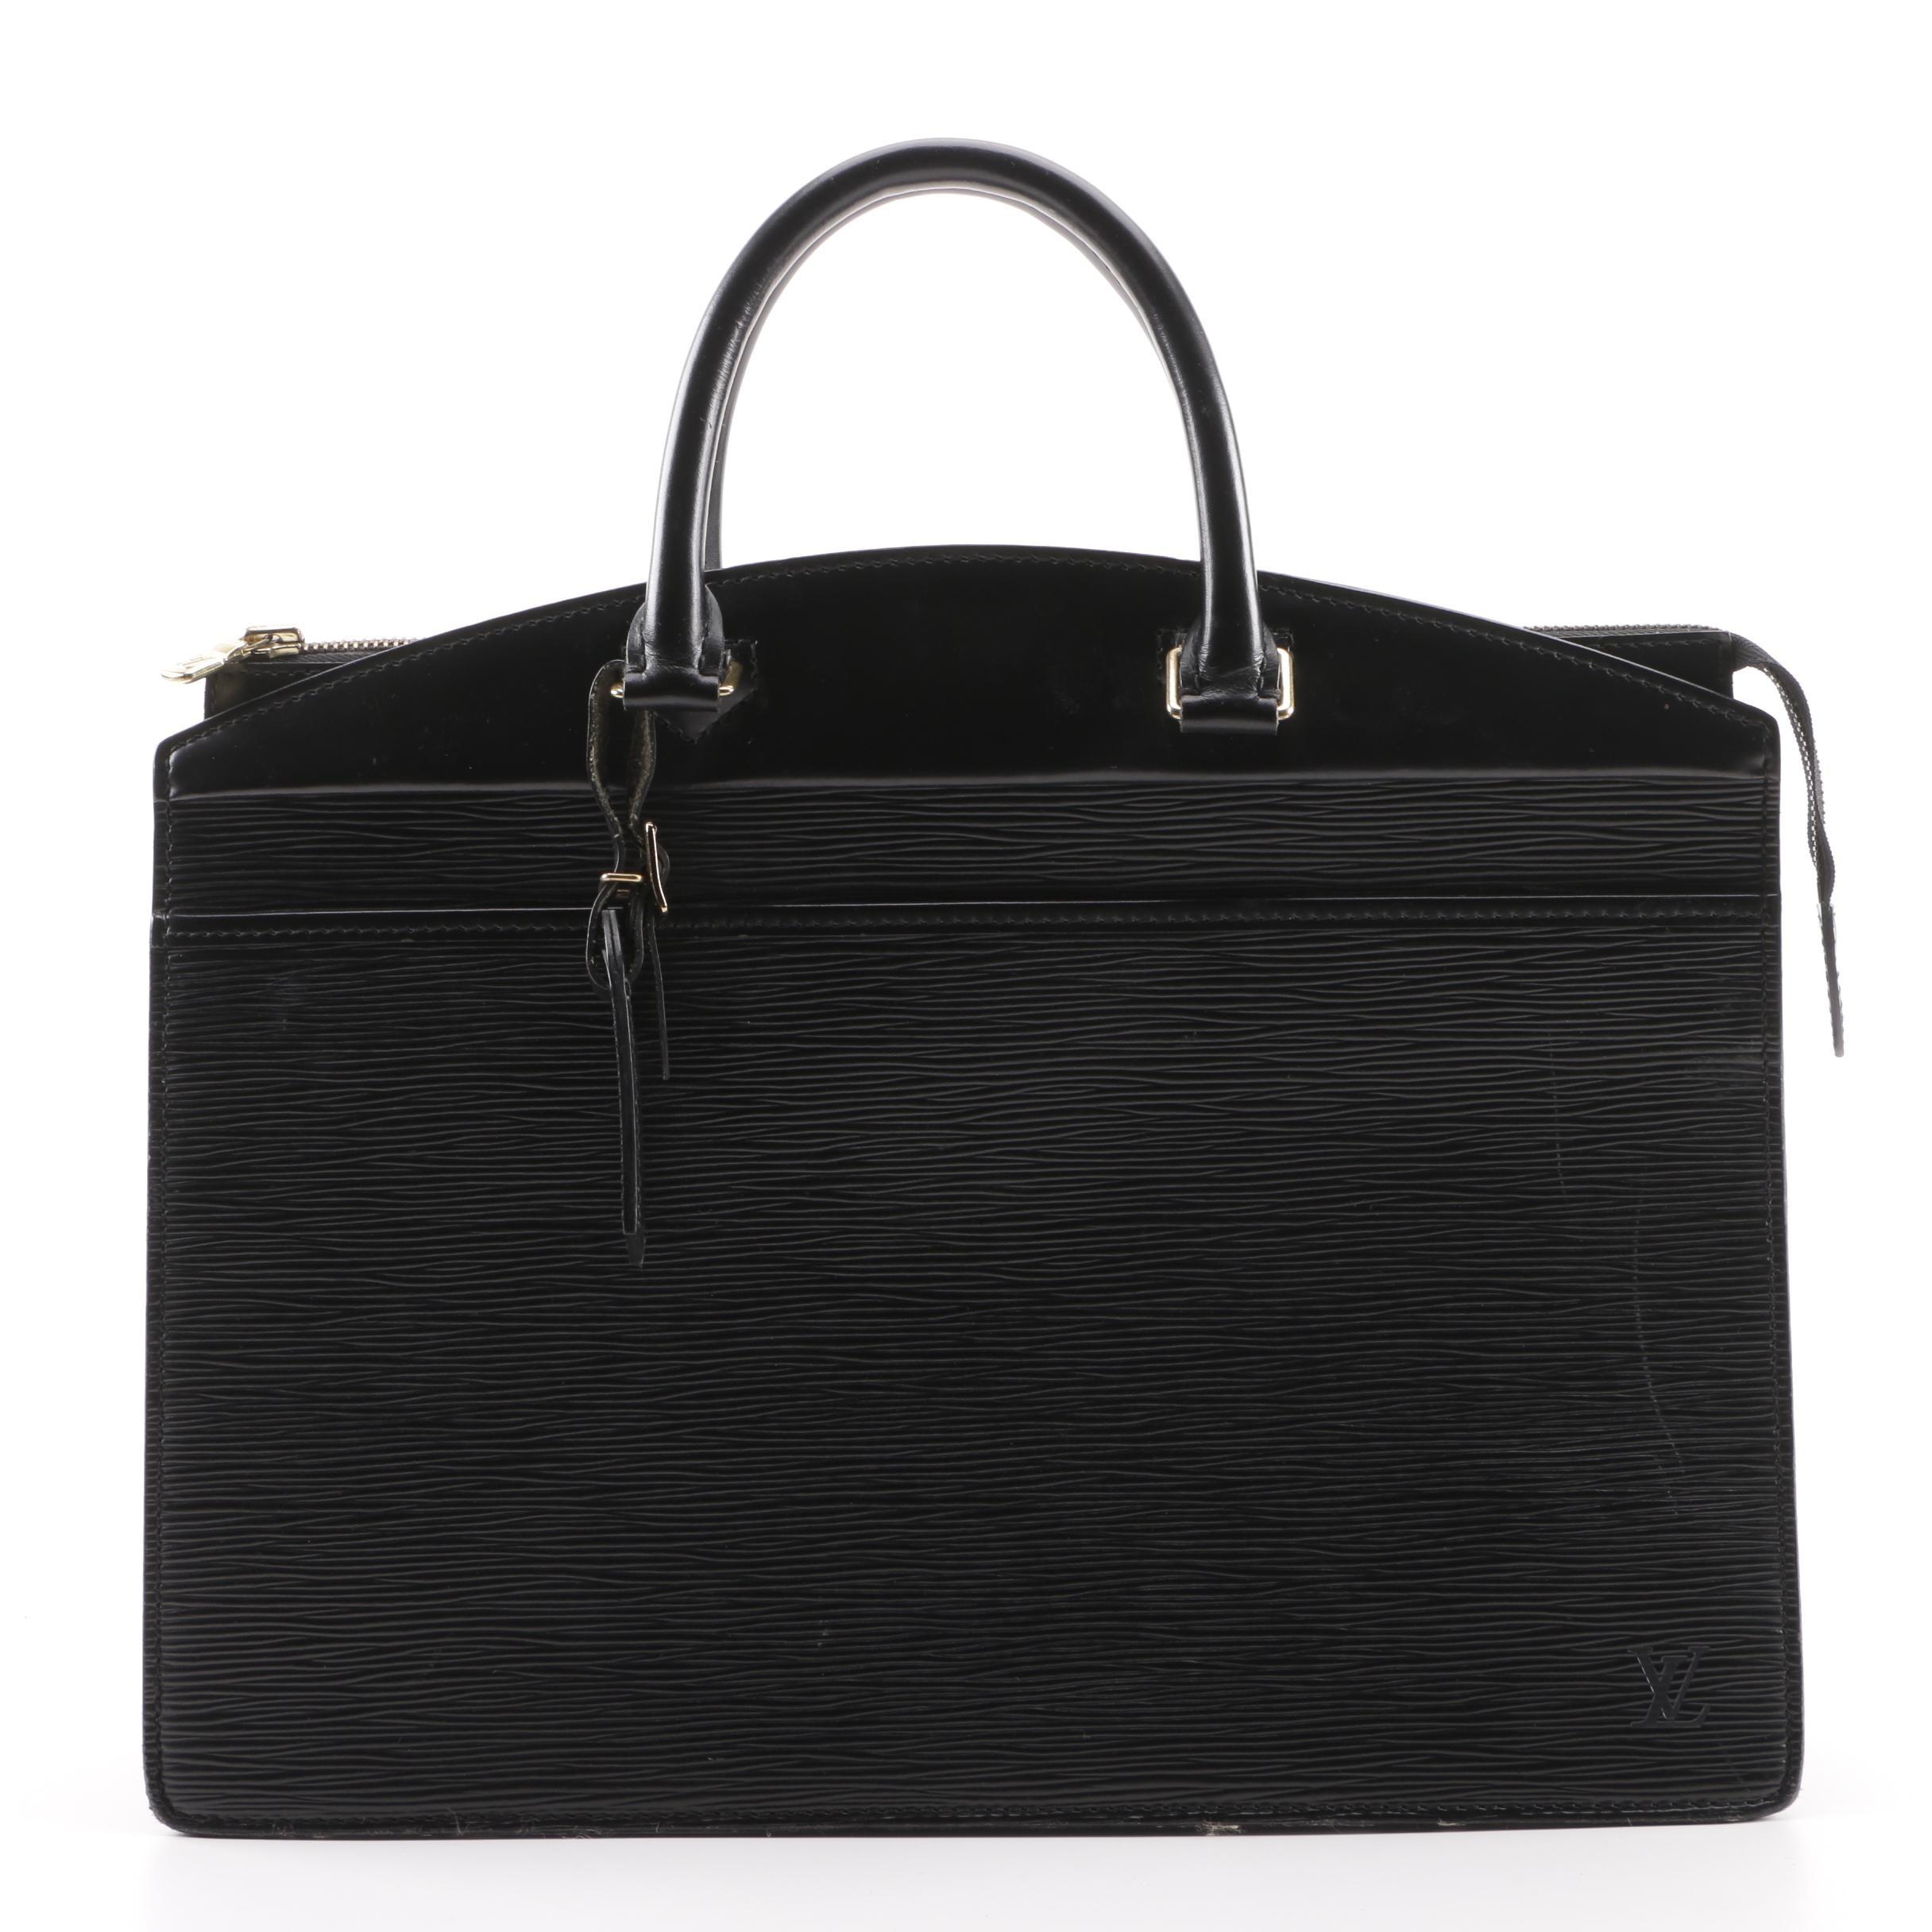 1996 Louis Vuitton Paris Black Epi Leather Riviera Tote